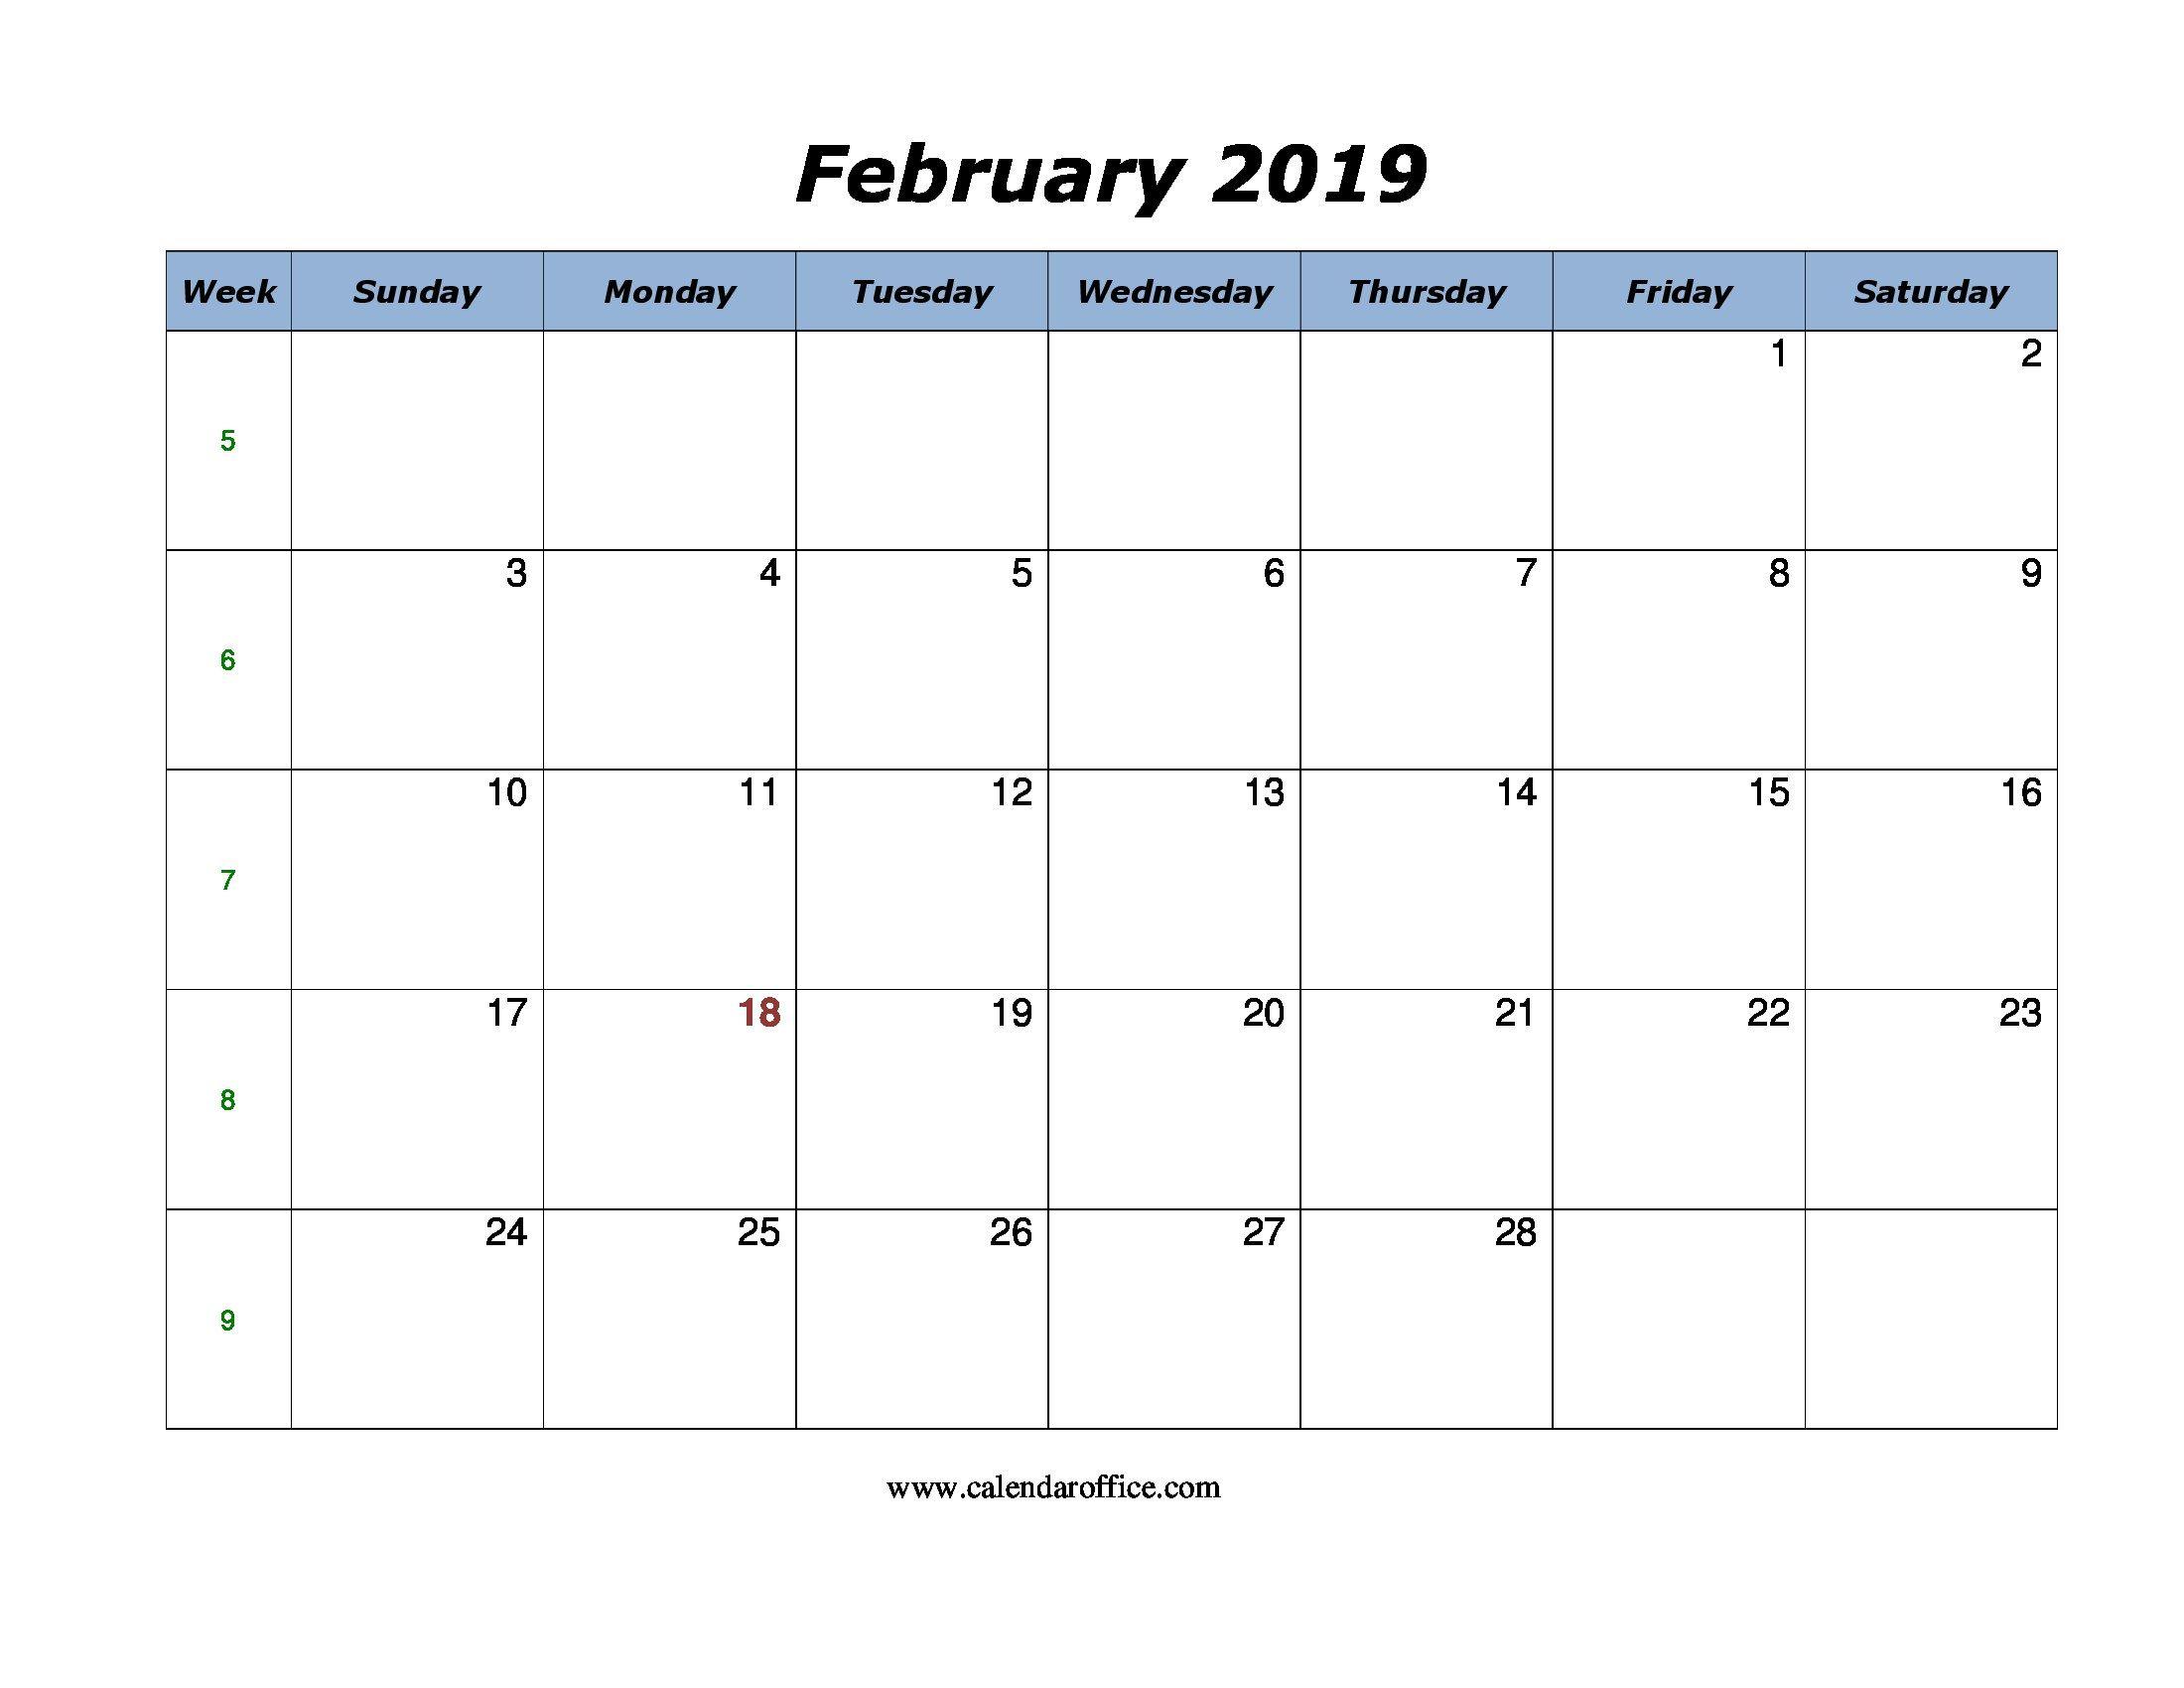 February 2019 Calendar Template Excel February February2019